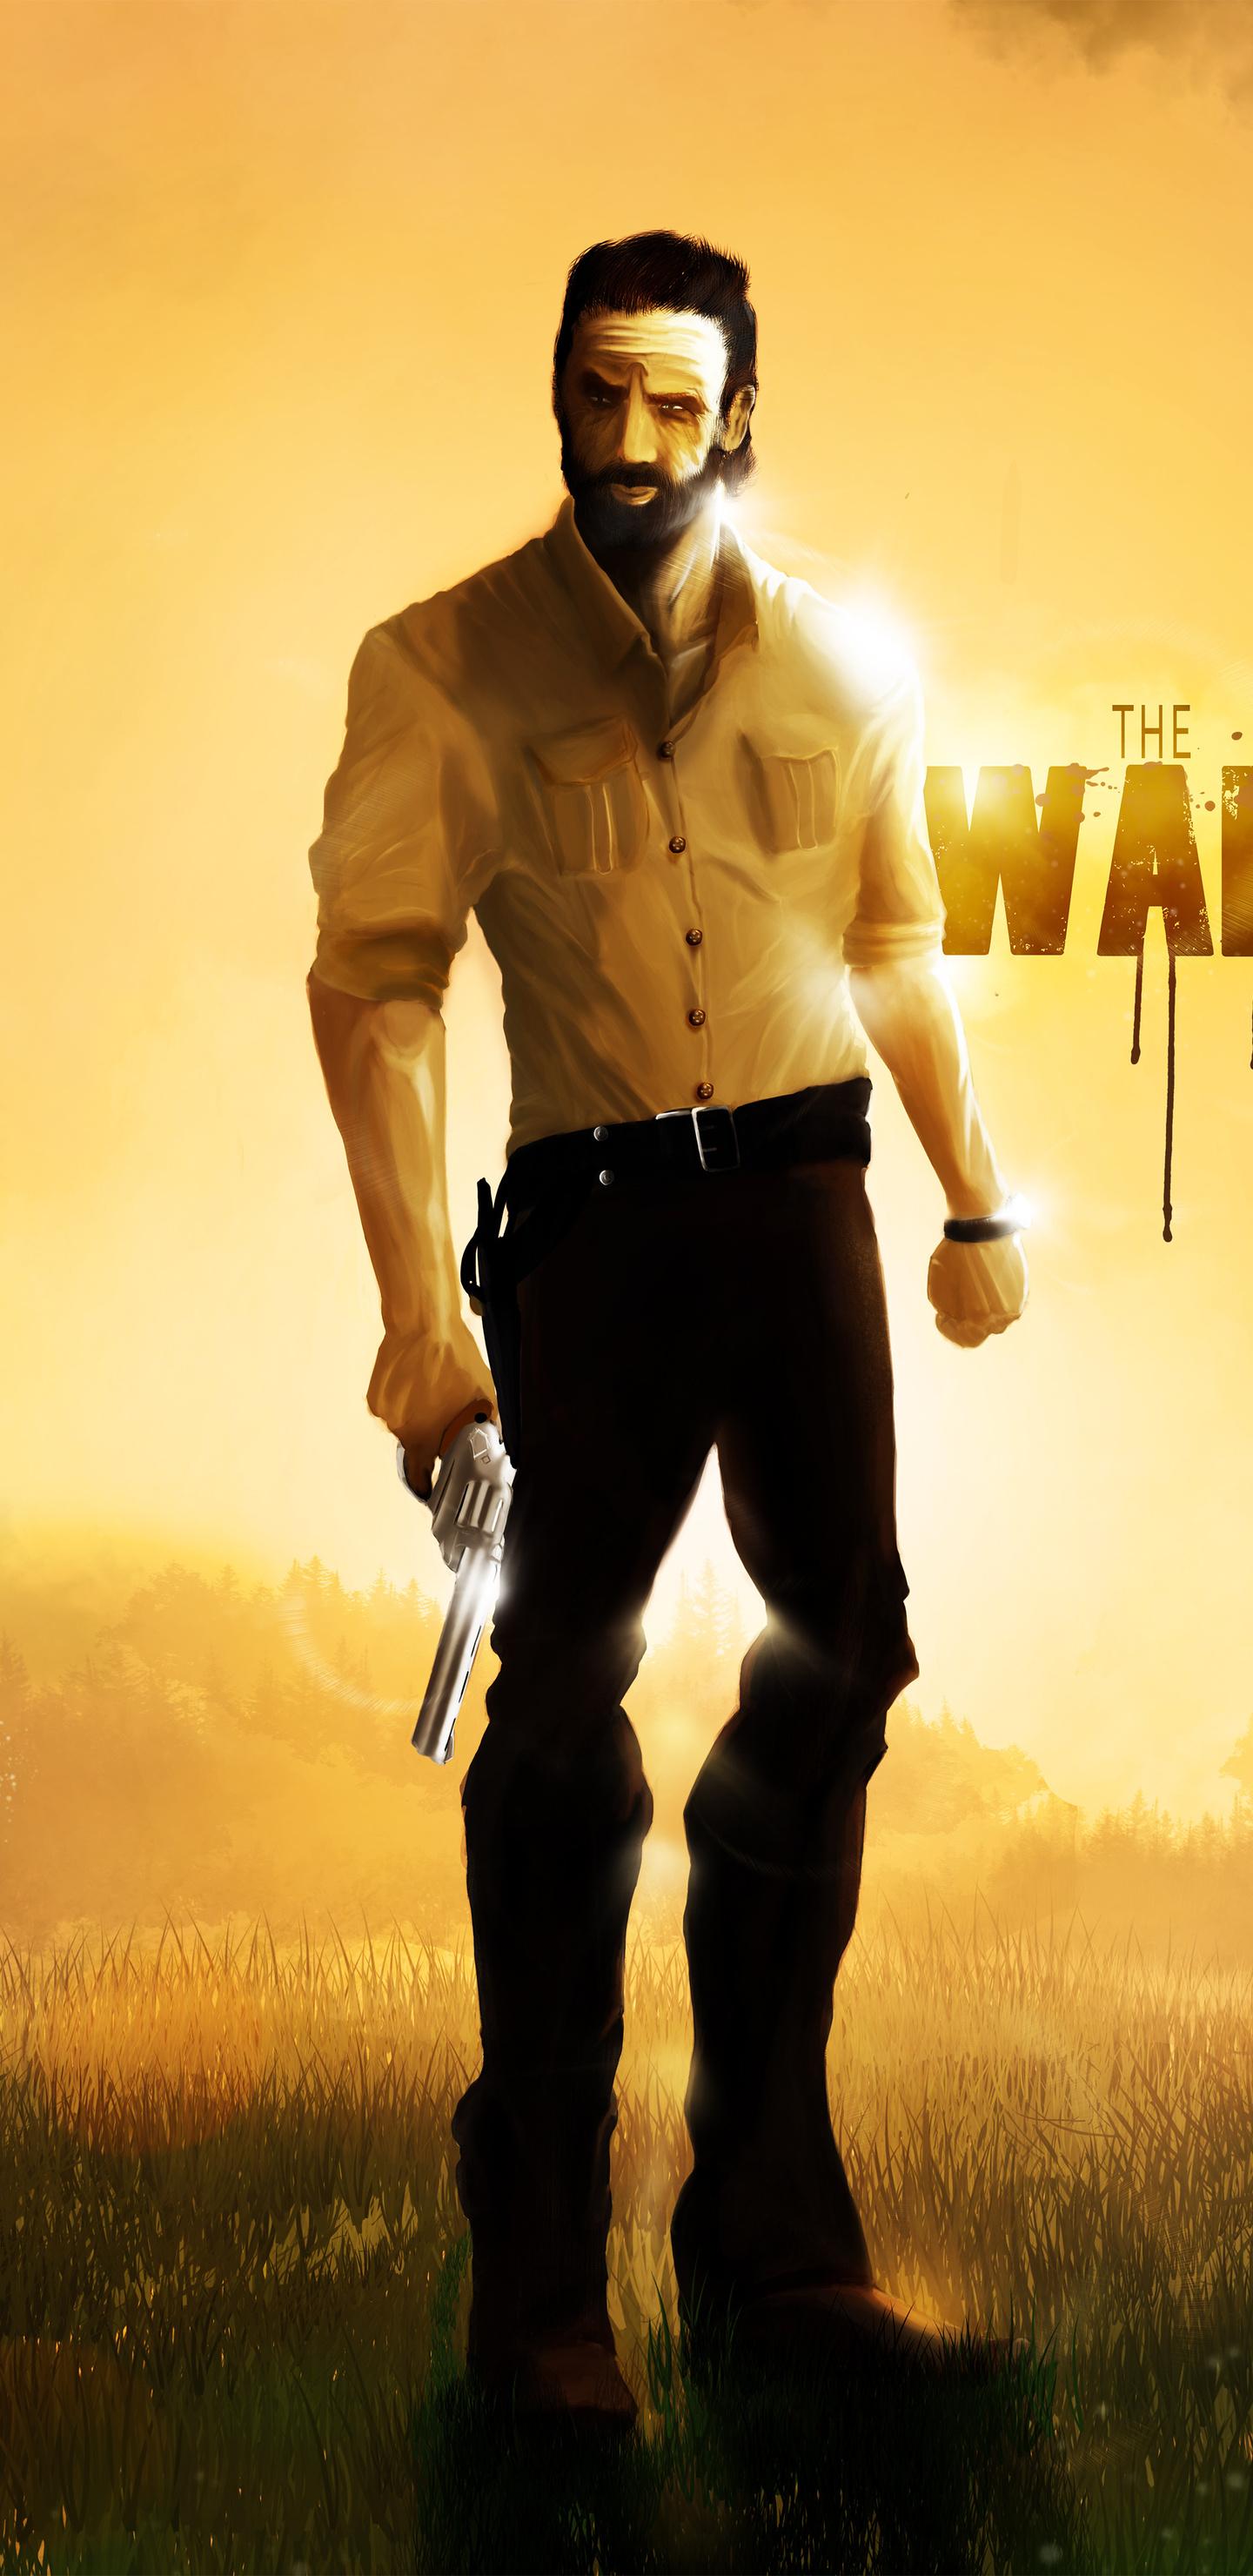 1440x2960 Rick Grimes The Walking Dead 5k Artwork Samsung Galaxy